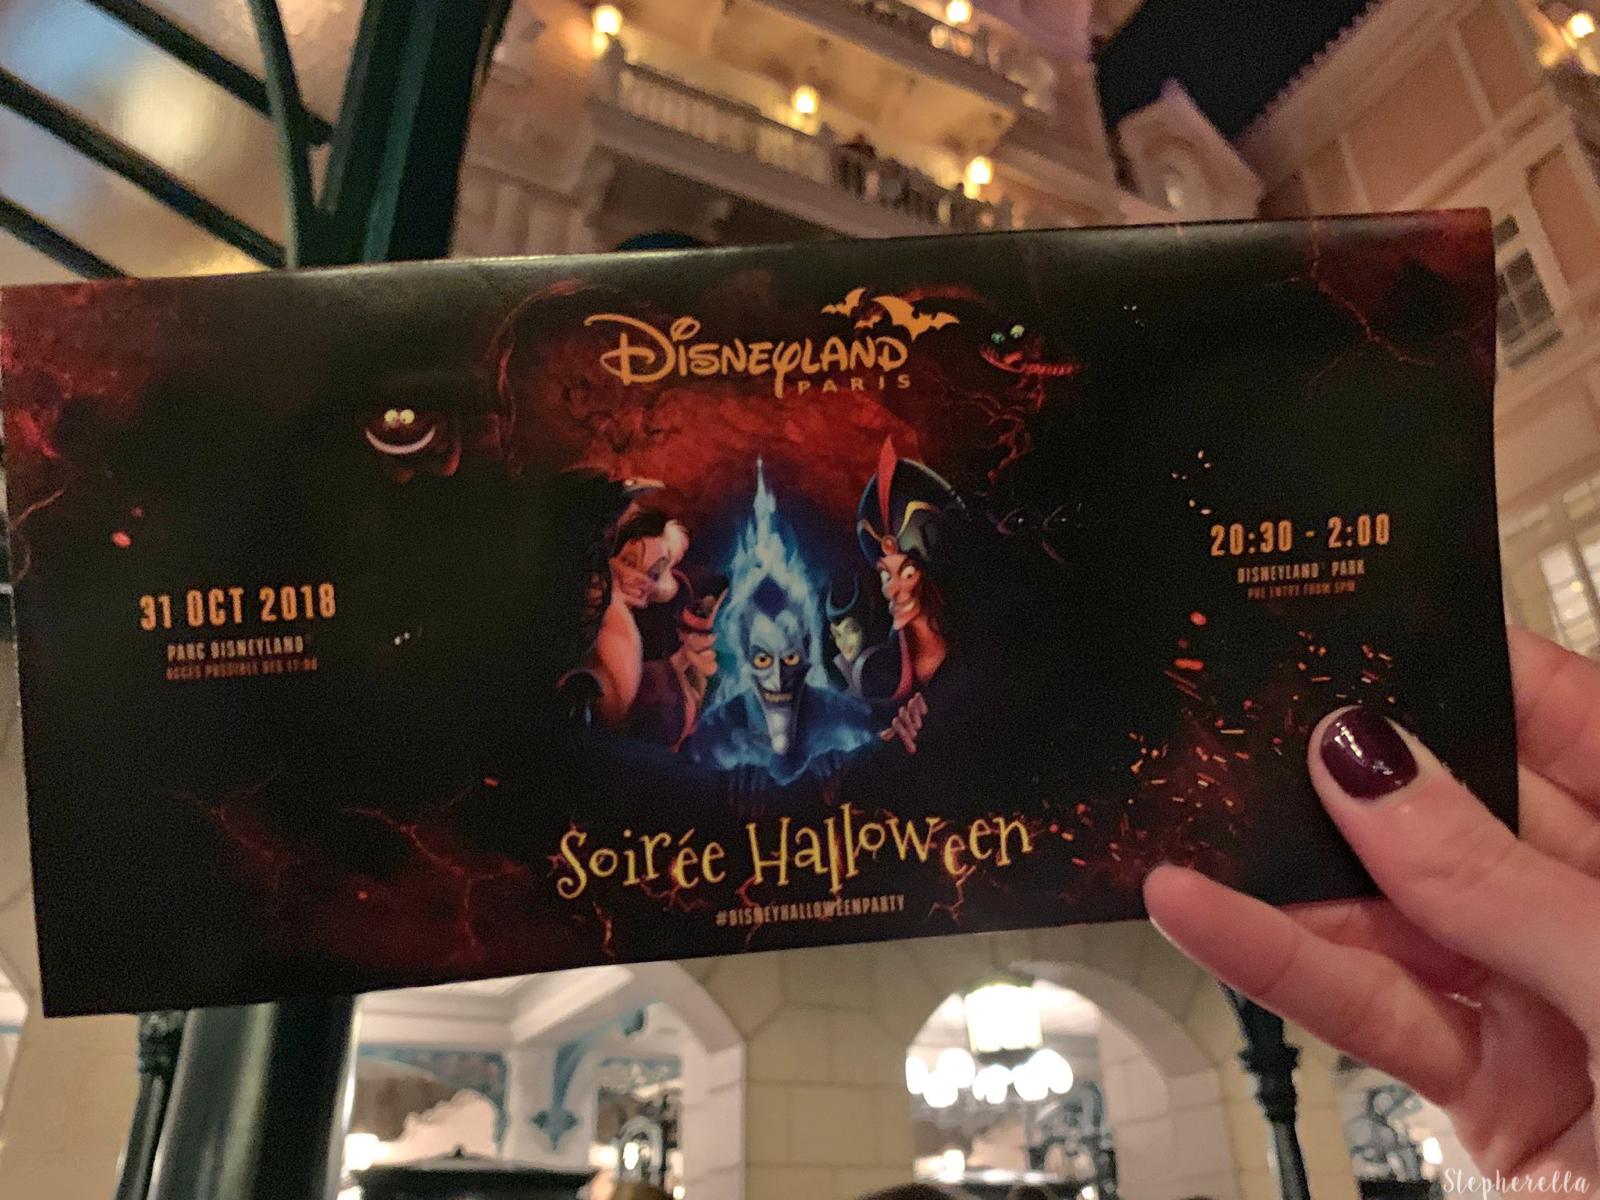 Halloween Soiree Programme Disneyland Paris